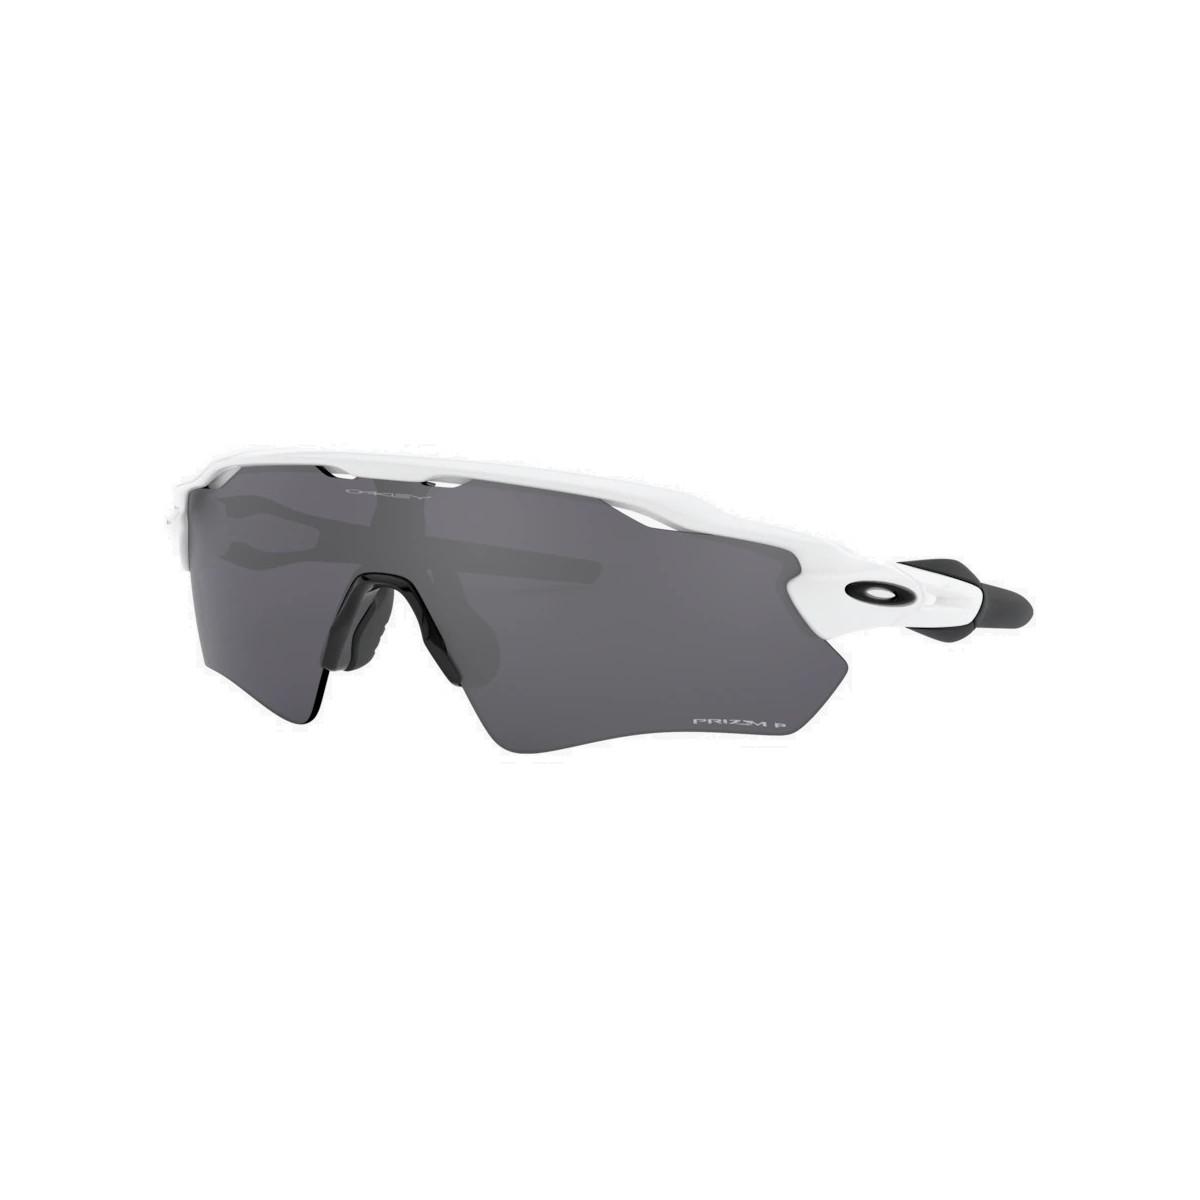 Óculos Oakley Radar Ev Path Polished White Prizm Black Polar